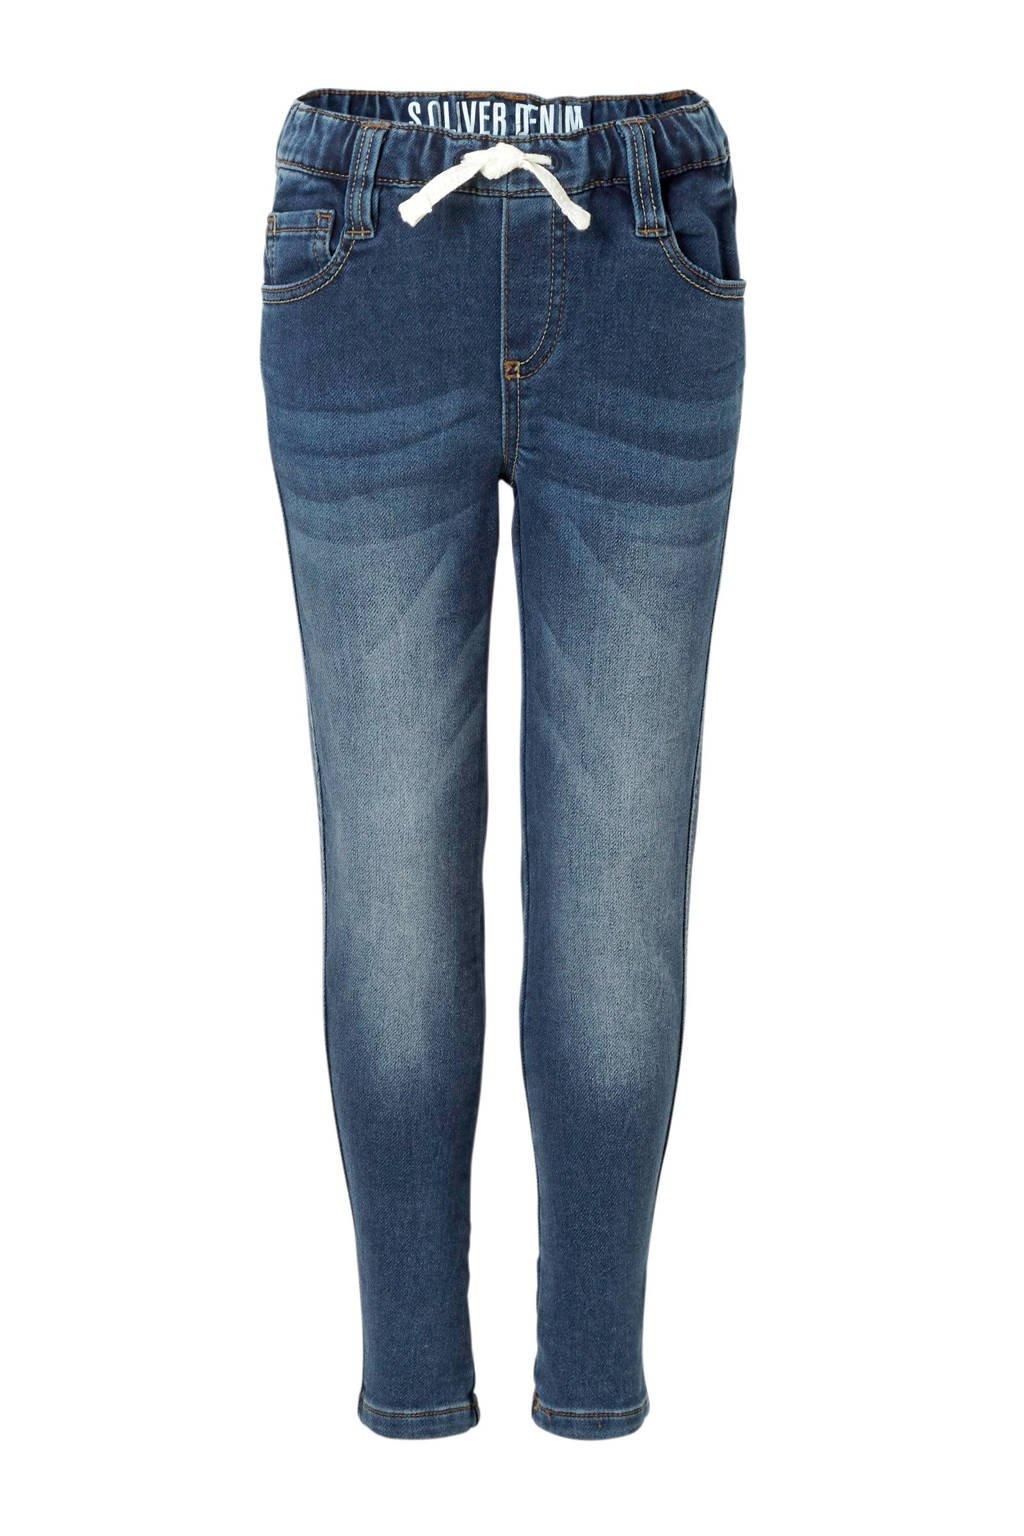 s.Oliver stone washed jeans denim, Blauw